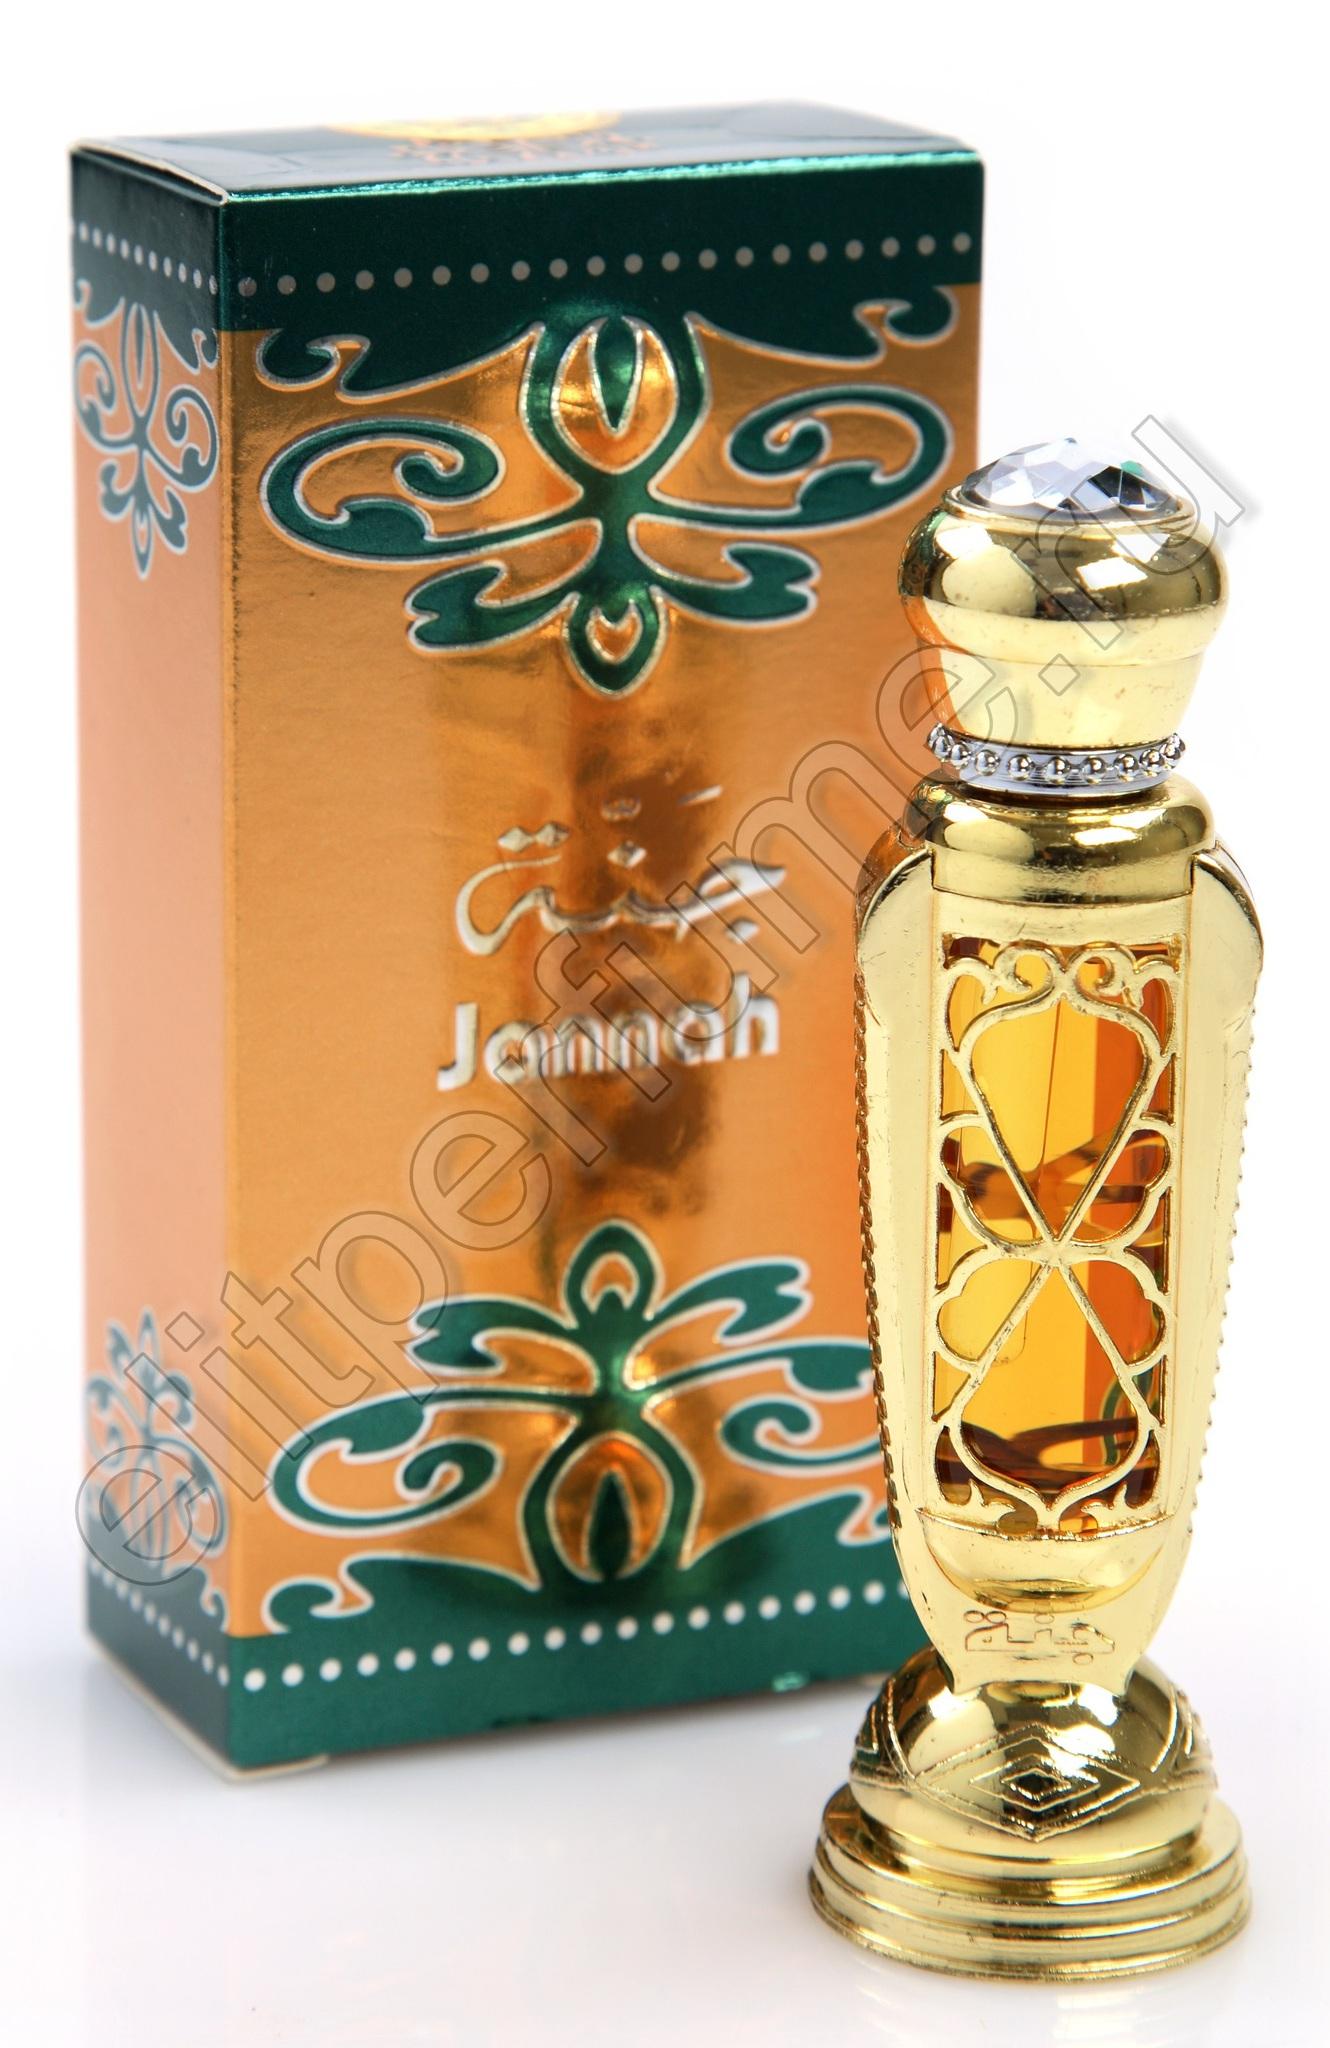 Джанна Jannah 12 мл арабские масляные духи от Аль Харамайн Al Haramain Perfumes